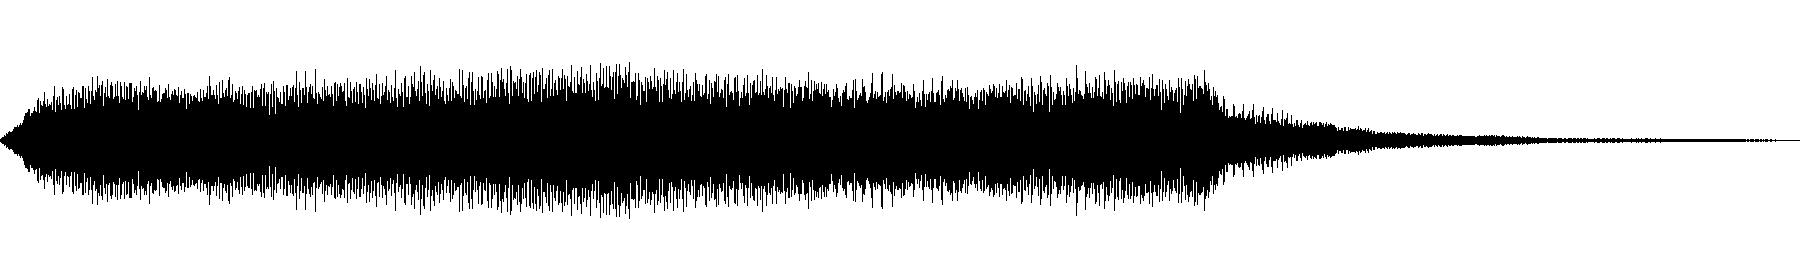 organ gsus4